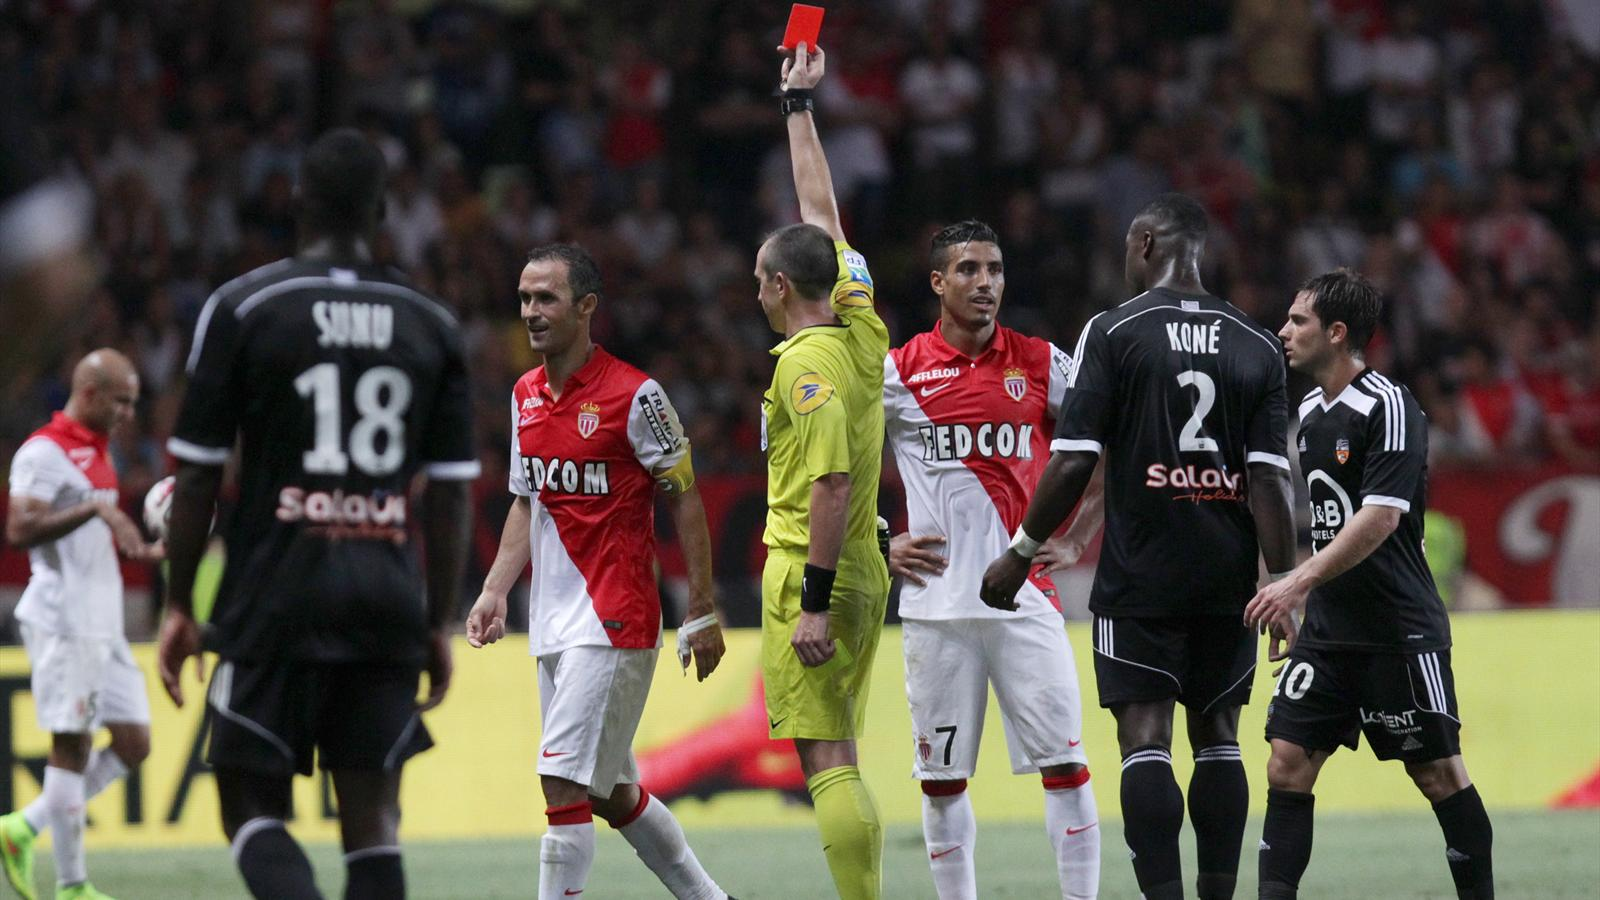 Monaco vs Lorient